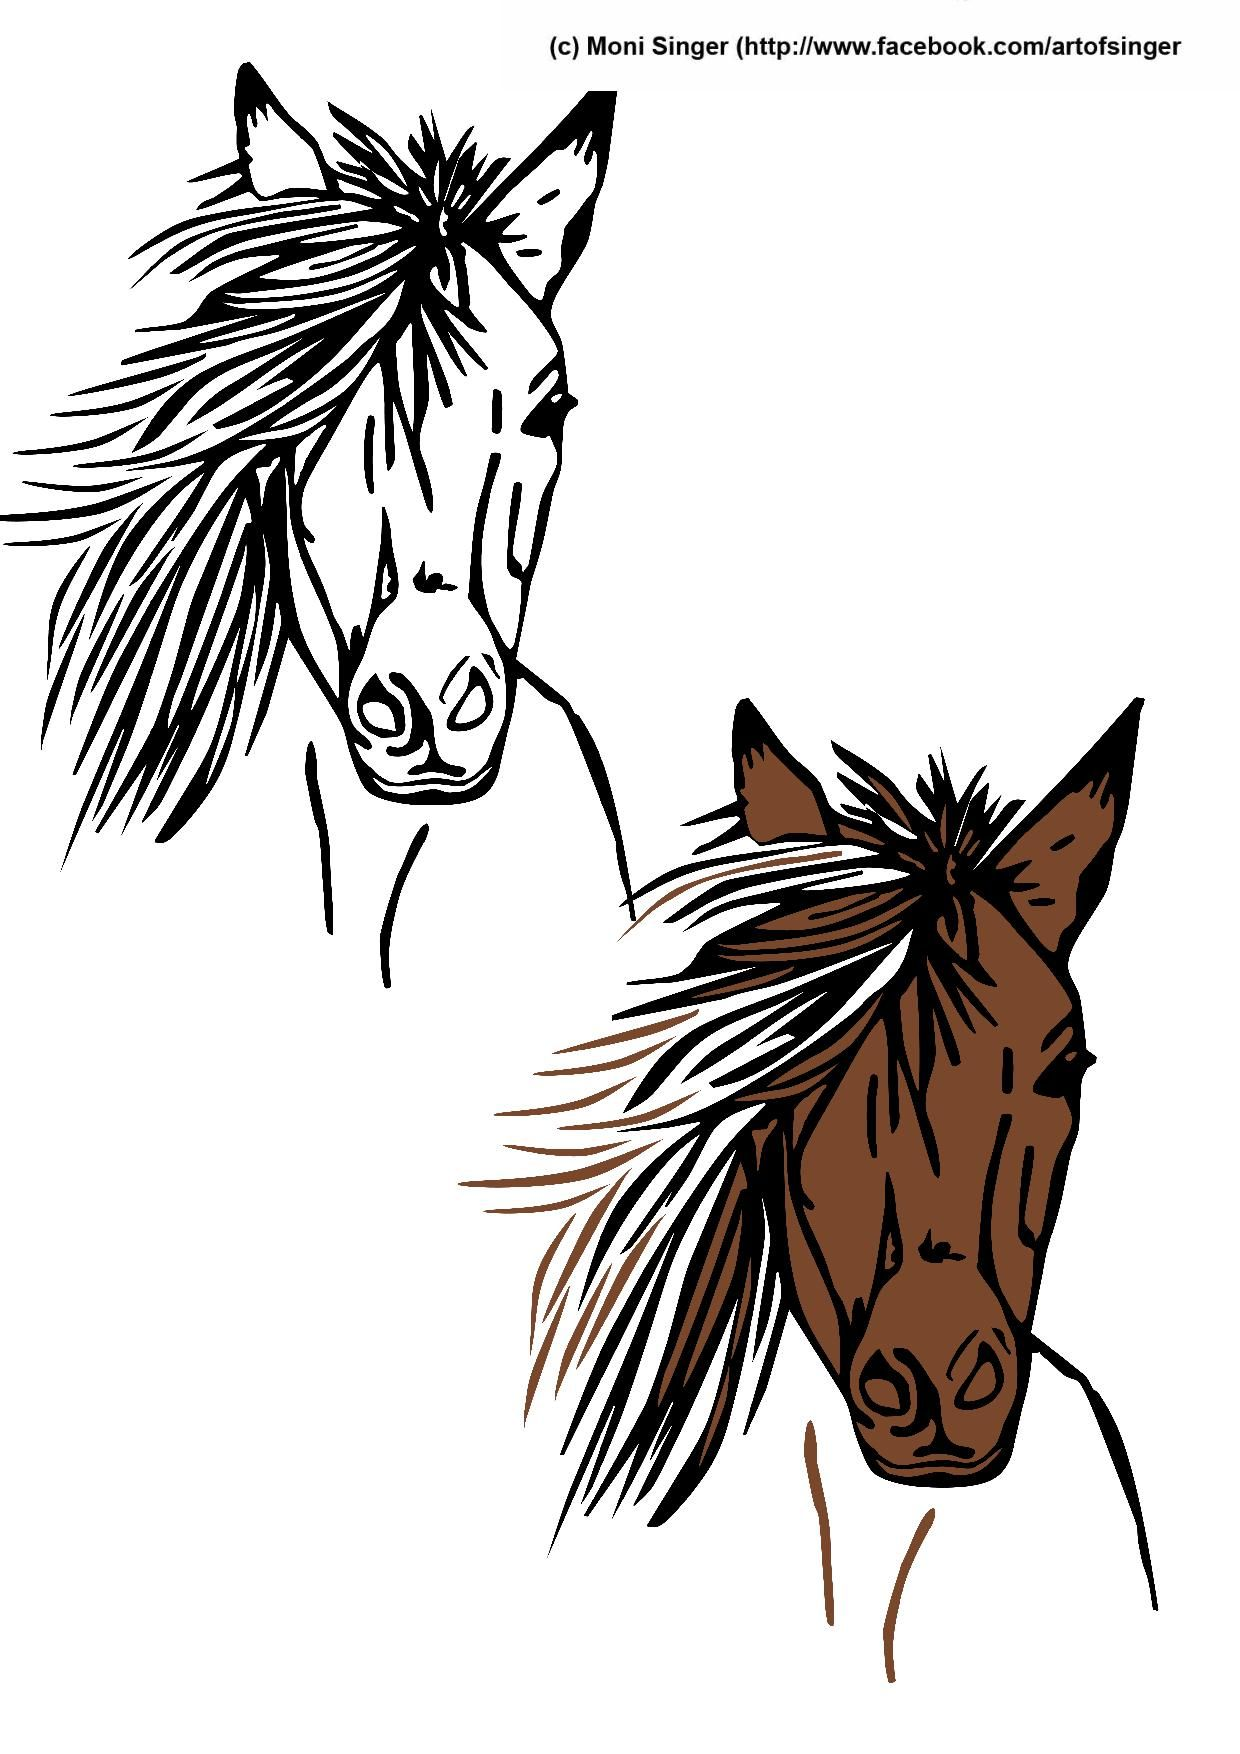 Silhouette Plotter File Free Plotter Datei Kostenlos Plotter Freebie Pferd Horse Plotten Plotterdatei Pferd